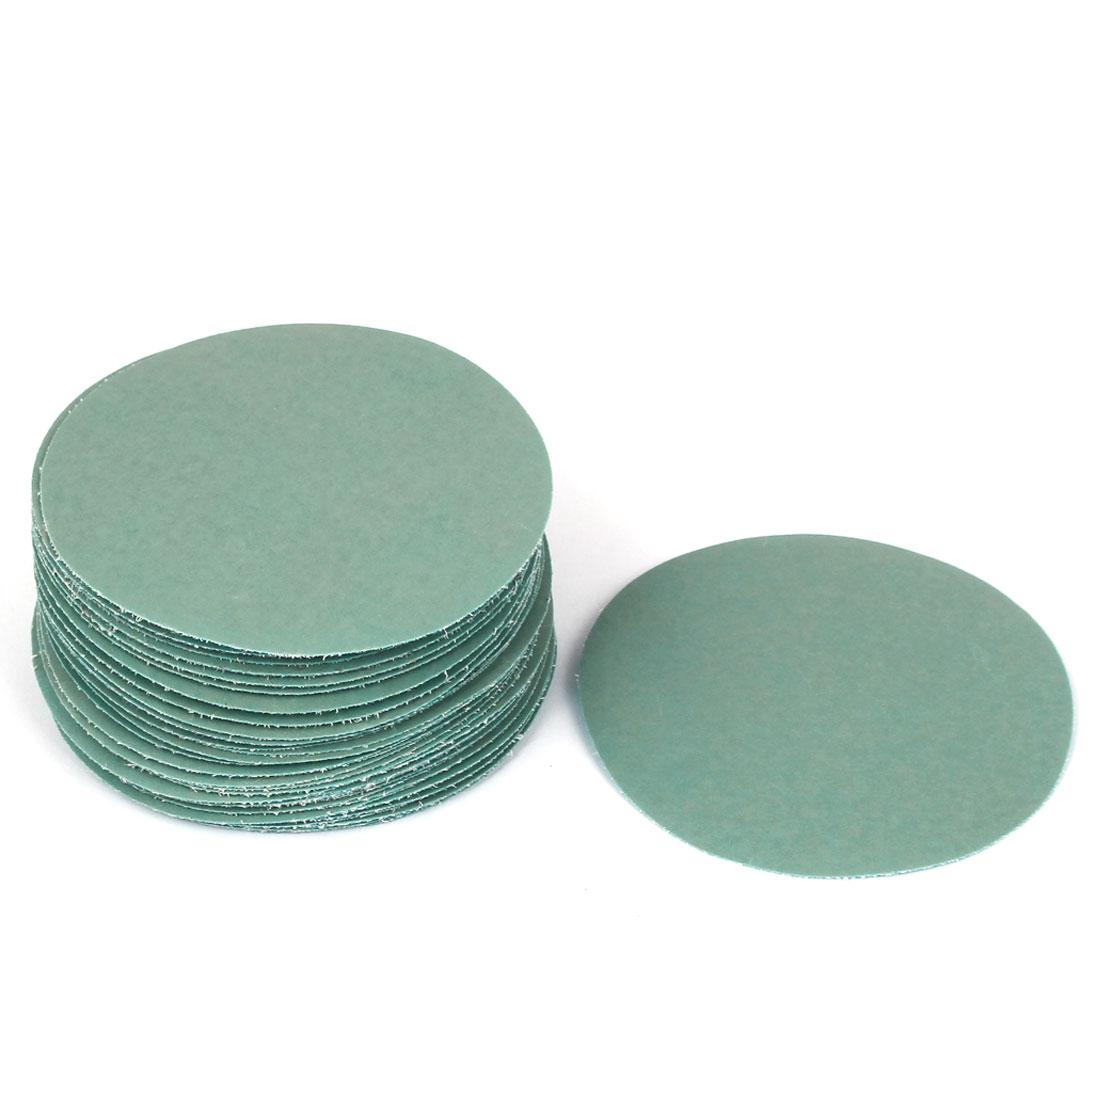 "4""Dia Wet Dry Silicon Carbide 7000 Grit Polishing Sand Paper 50pcs"